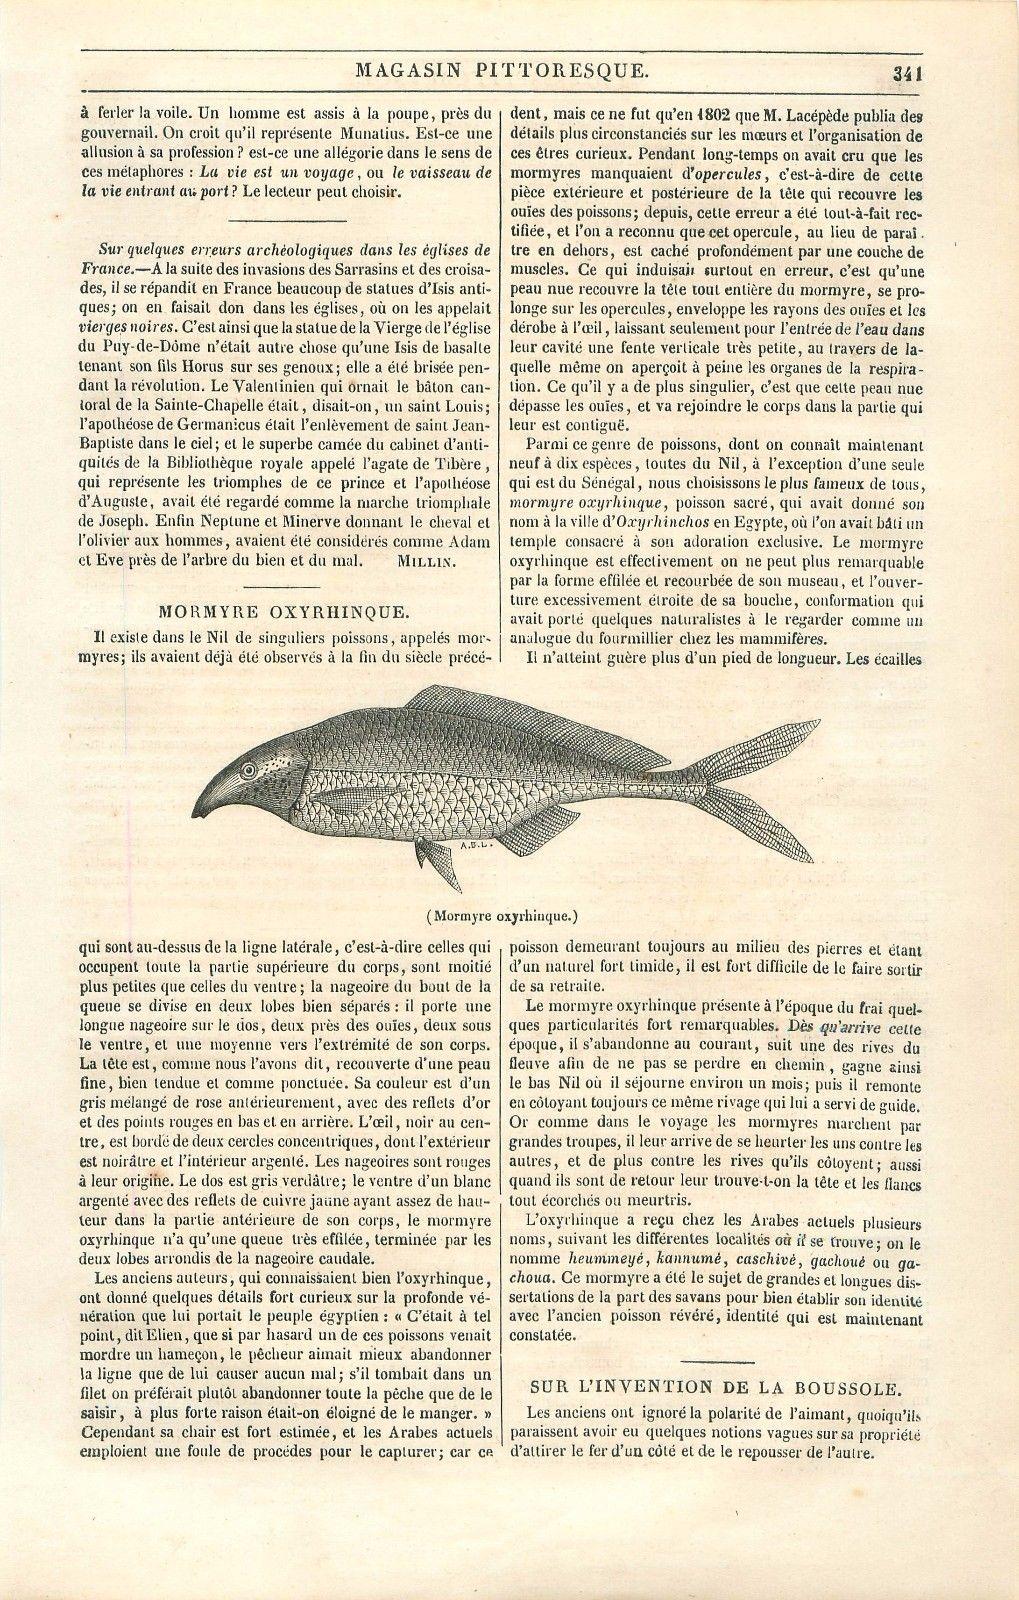 Mormyre oxyrhinque campylomormyrus poisson nil egypte gravure antique